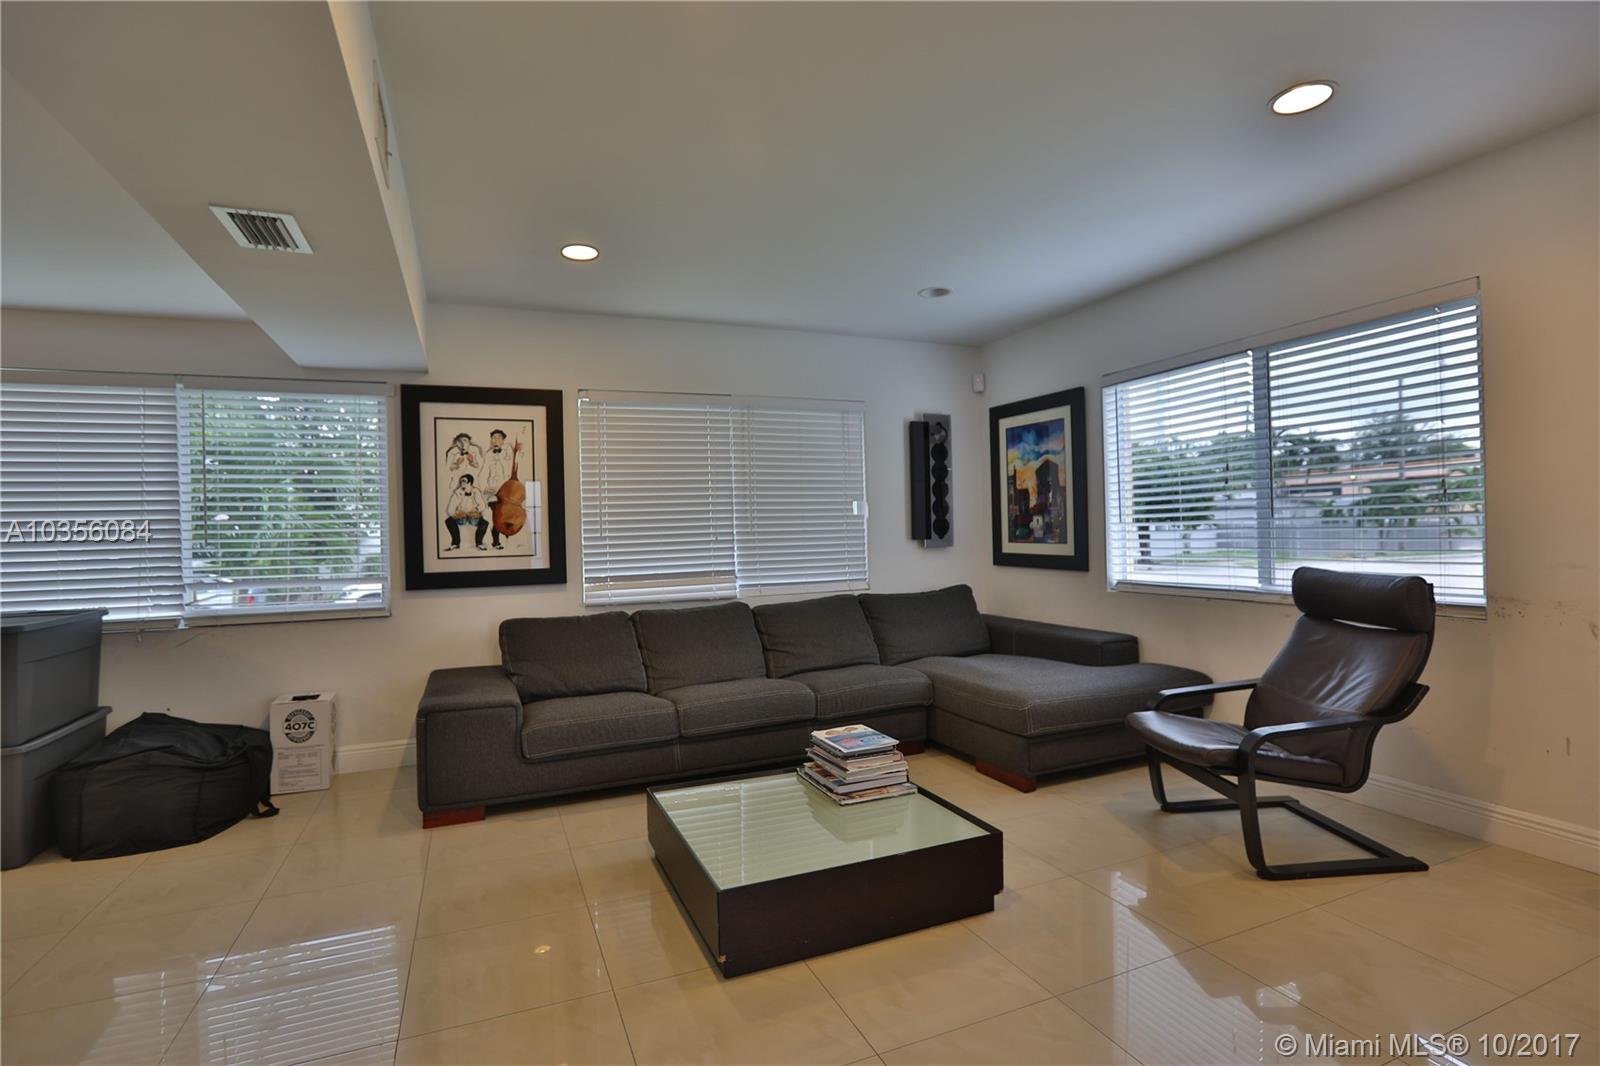 2112 Sw 31st Ave, Miami FL, 33145